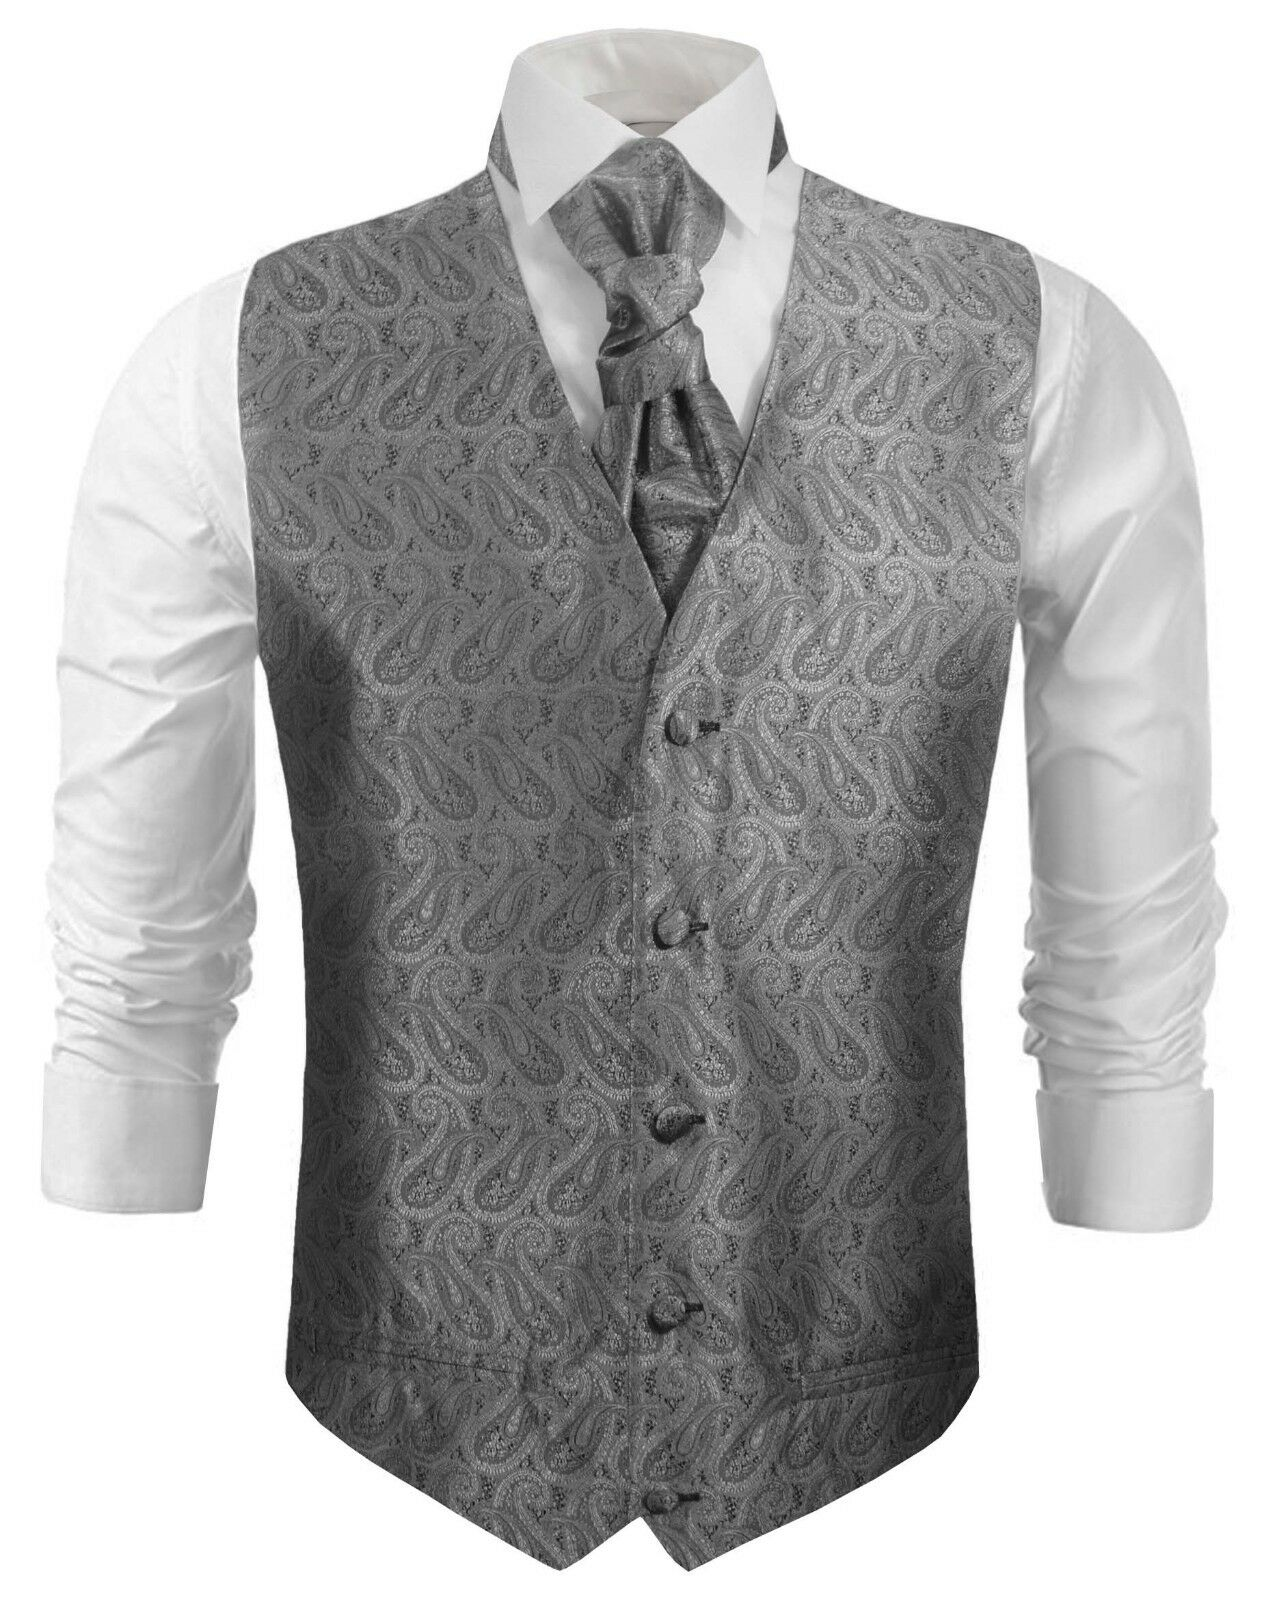 Paul Malone Hochzeitsweste mit Plastron silber grau schwarz paisley v30